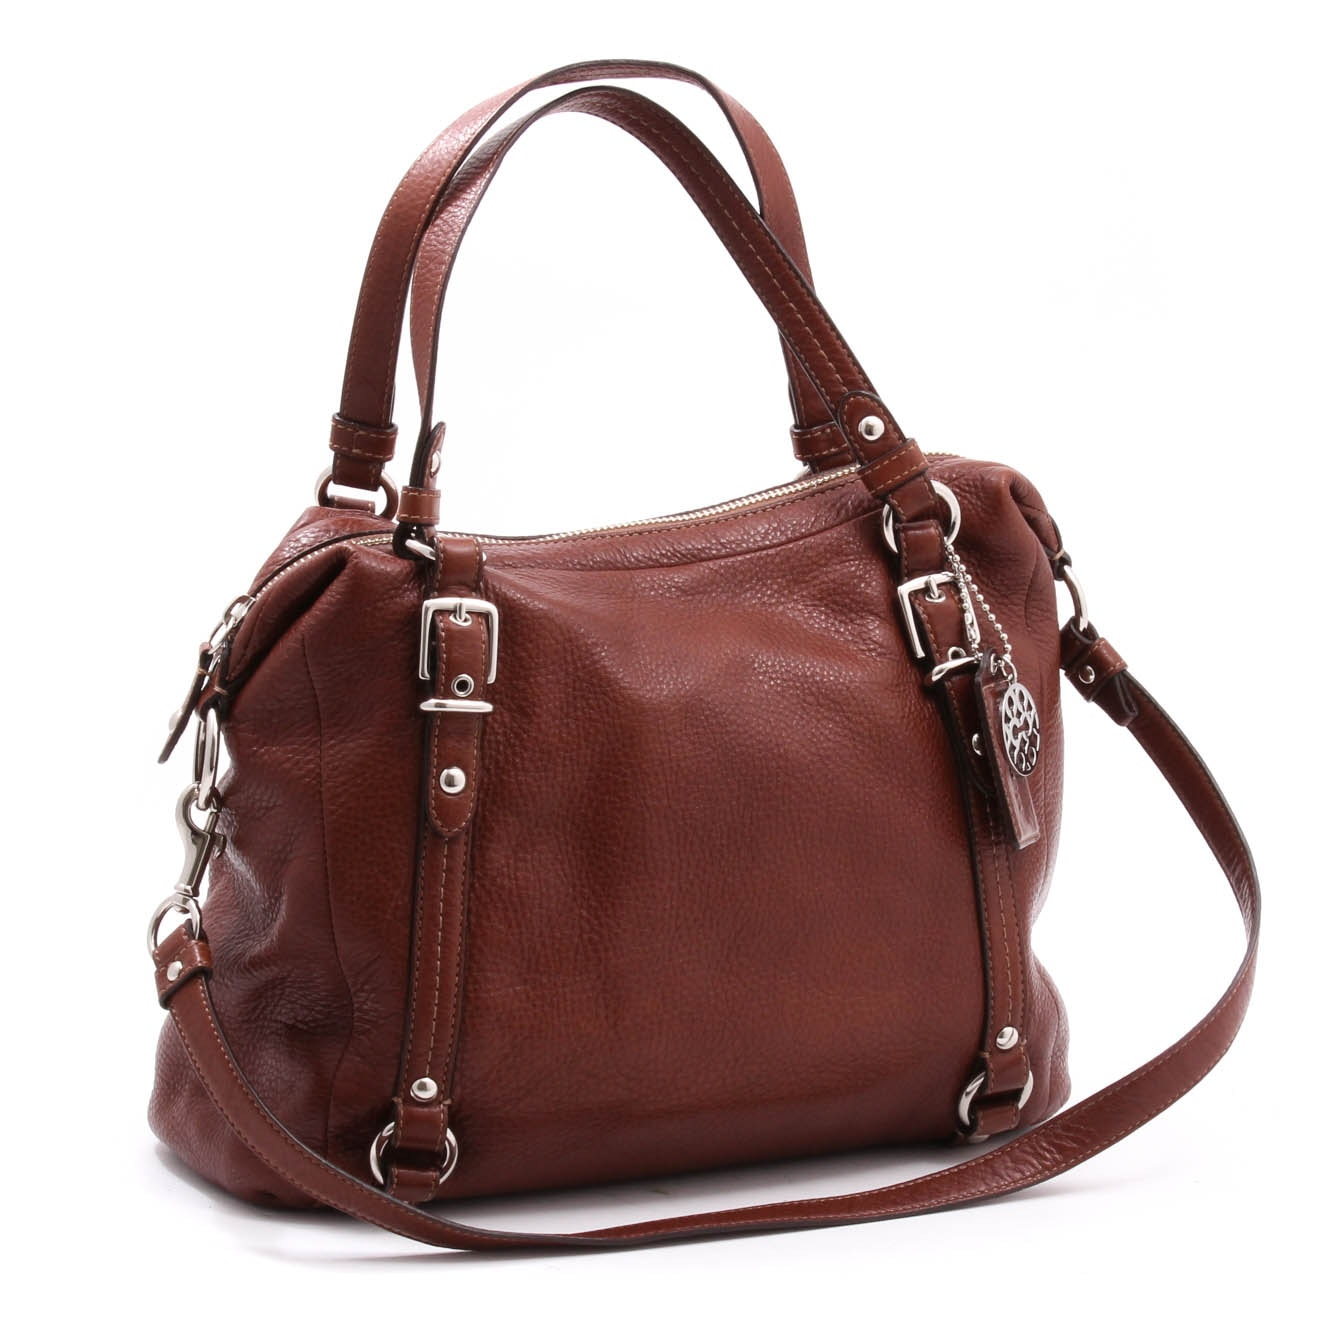 Coach Brown Pebble Leather Alexandra Shoulder Bag